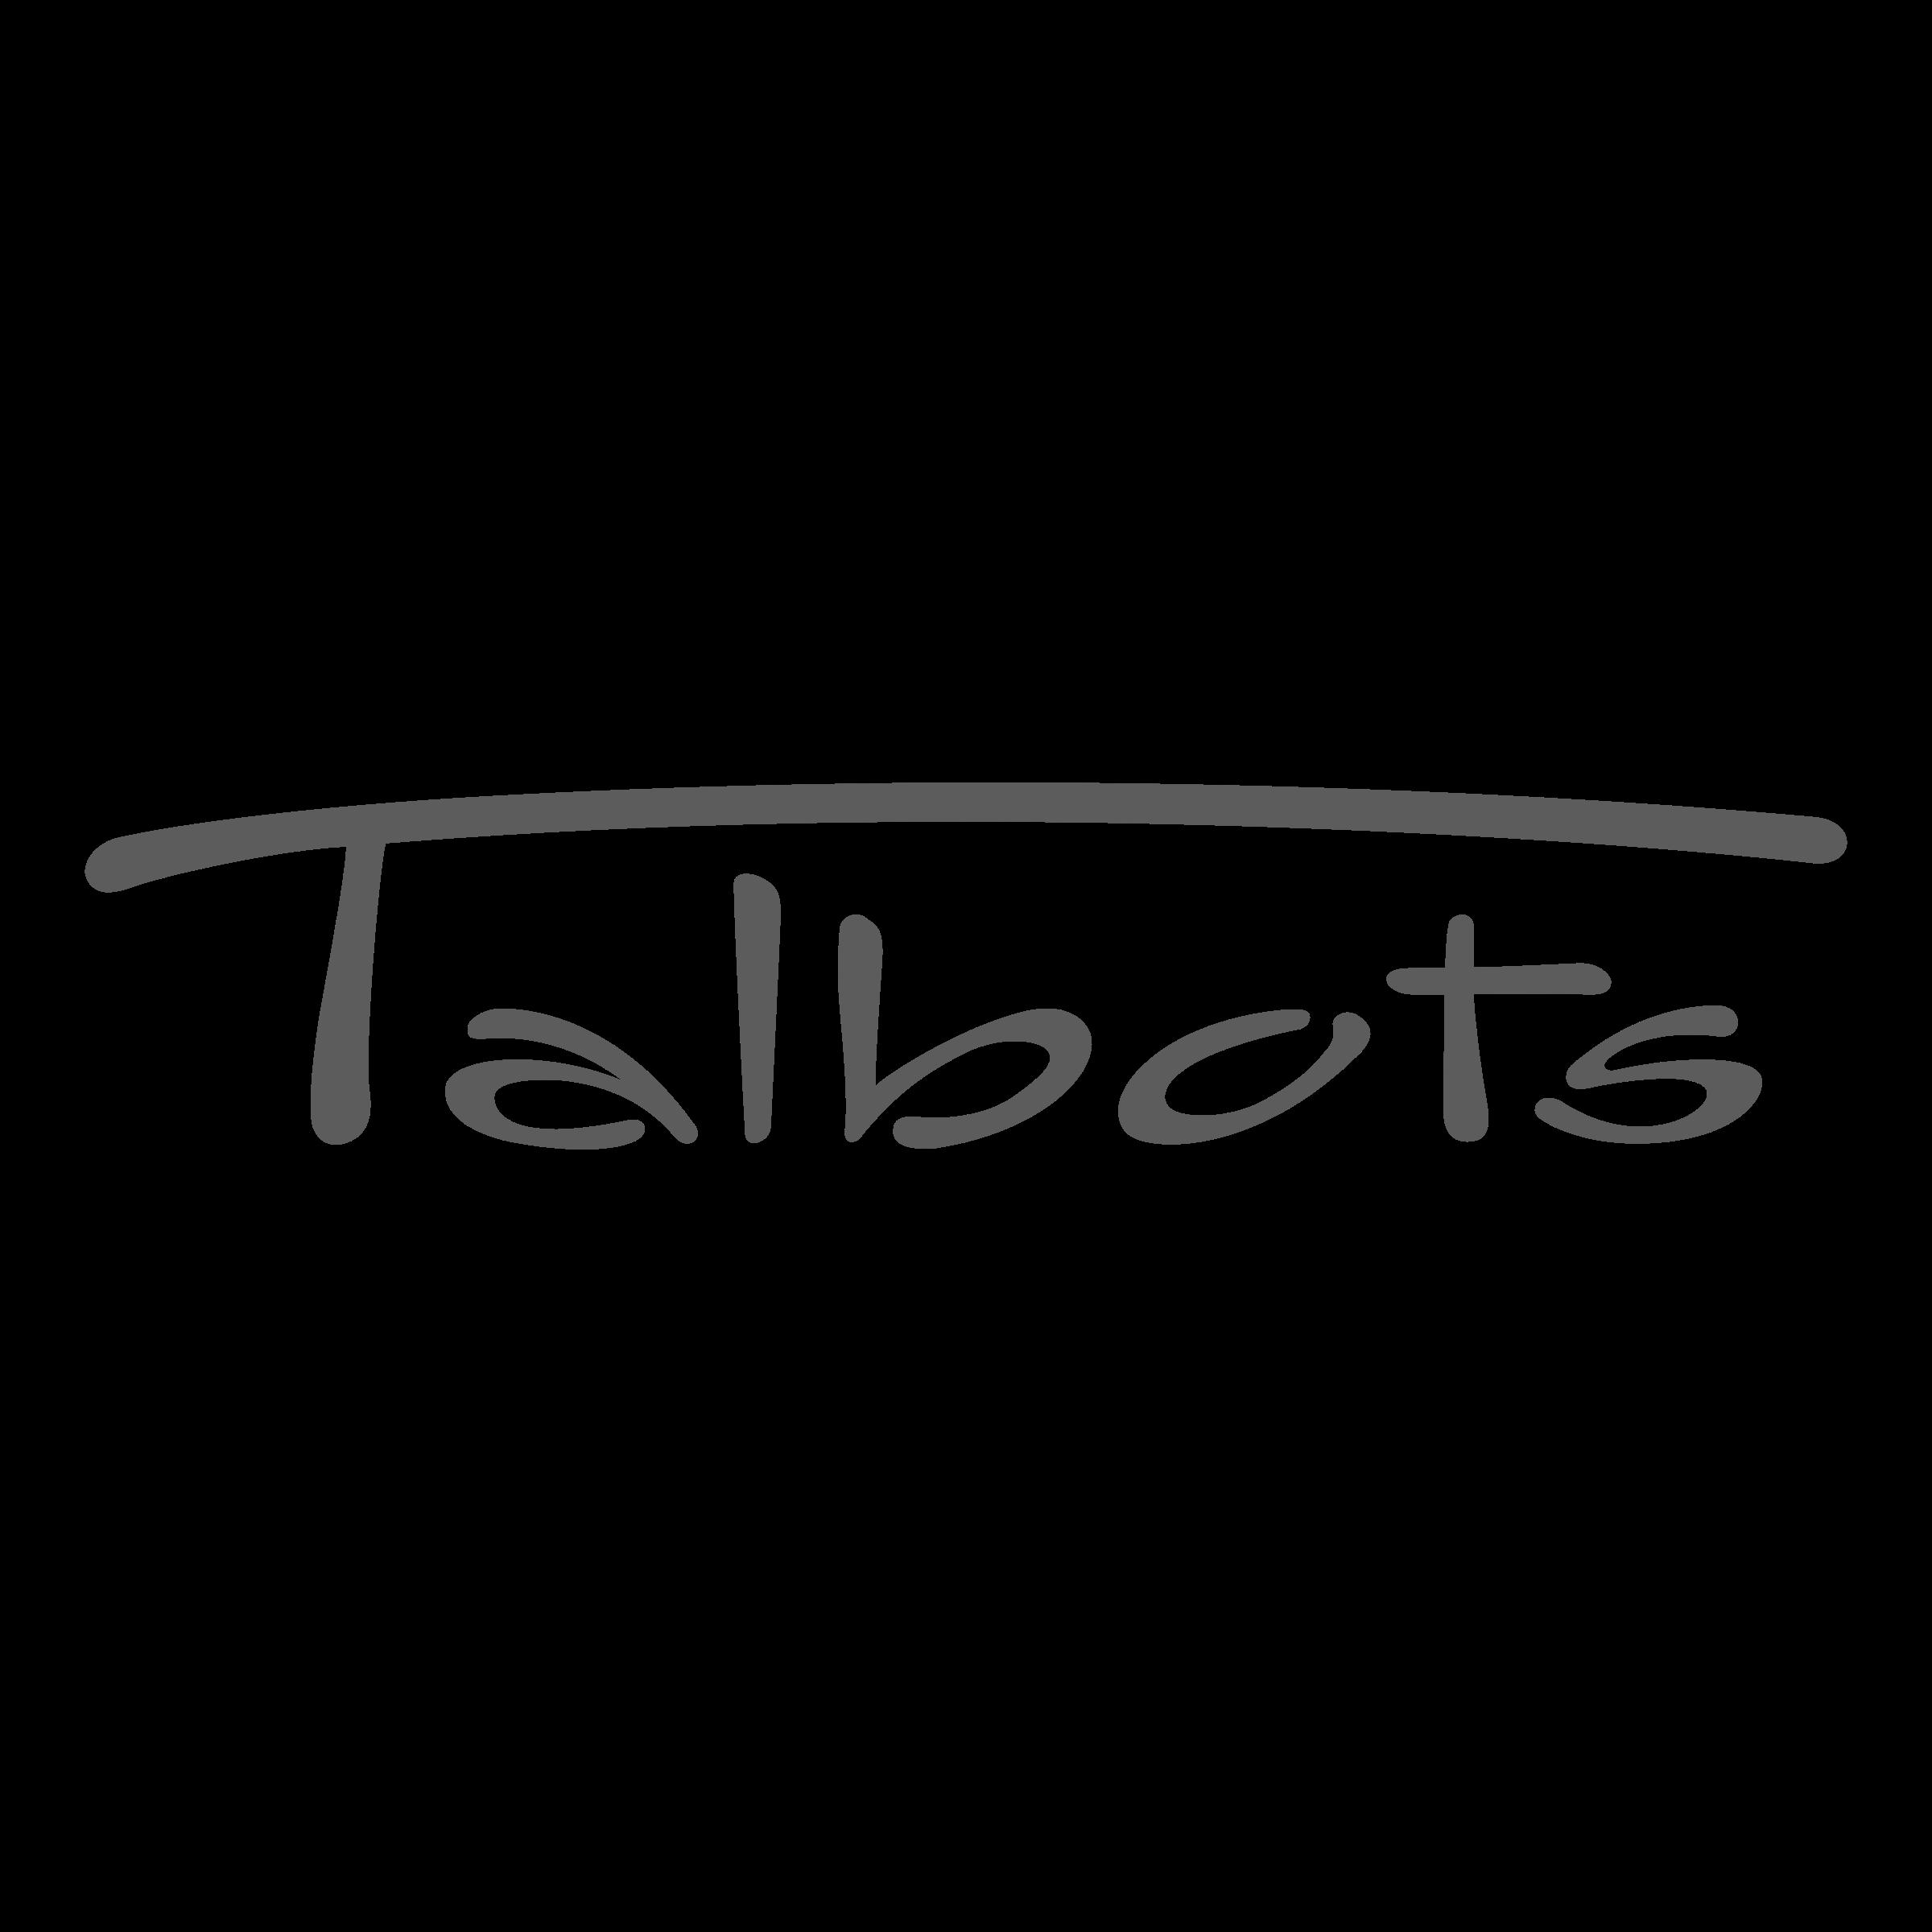 talbots-1-logo-png-transparent.png